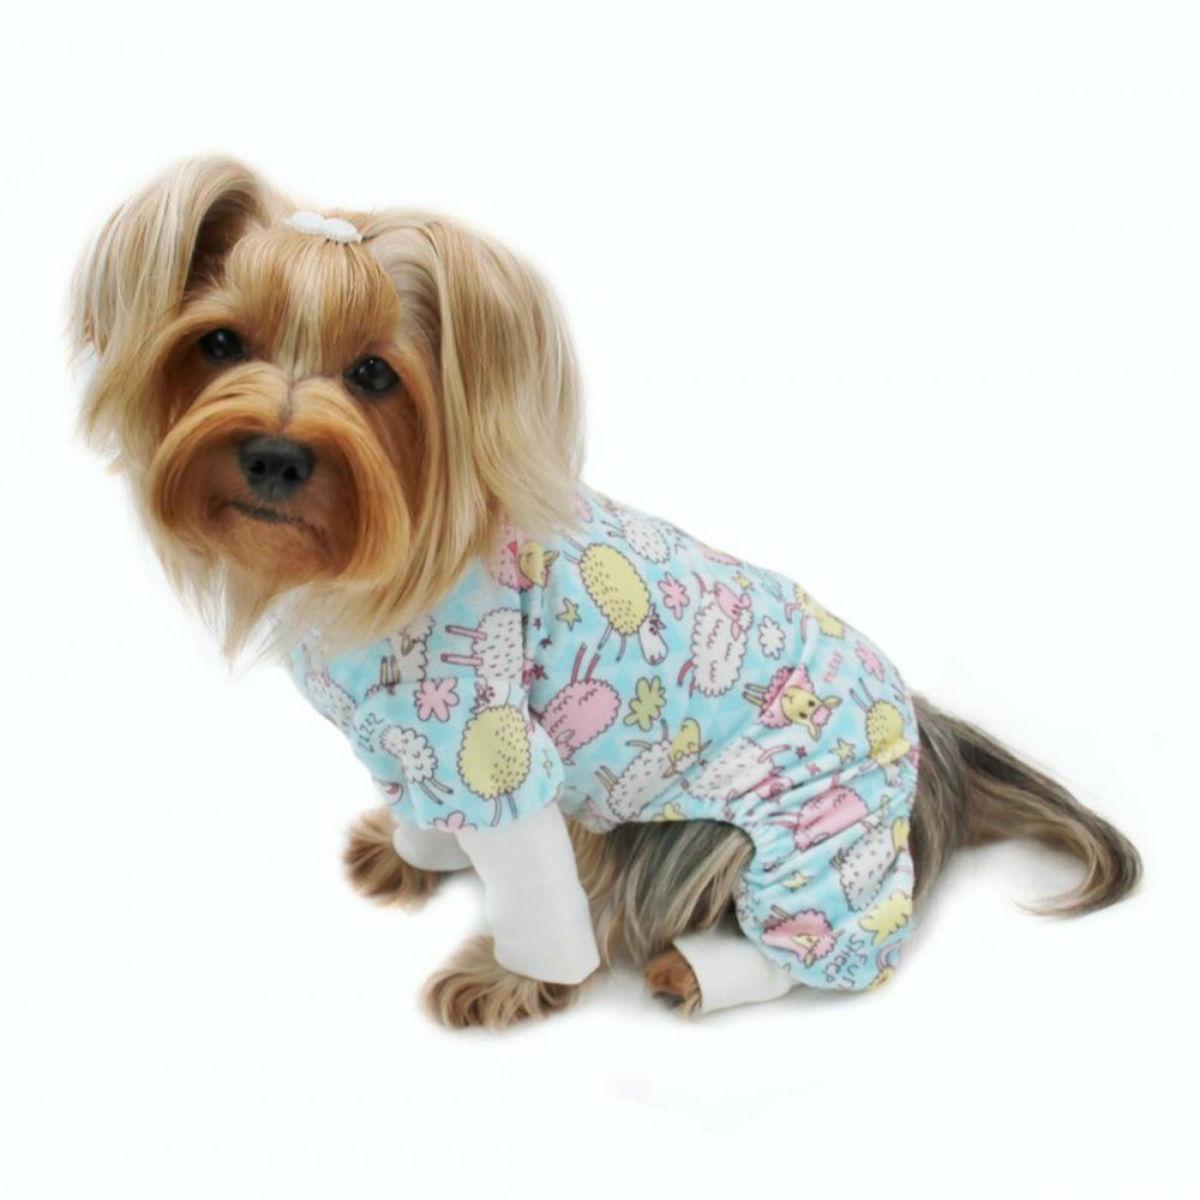 Funny Sheep Ultra Soft Dog Pajamas by Klippo